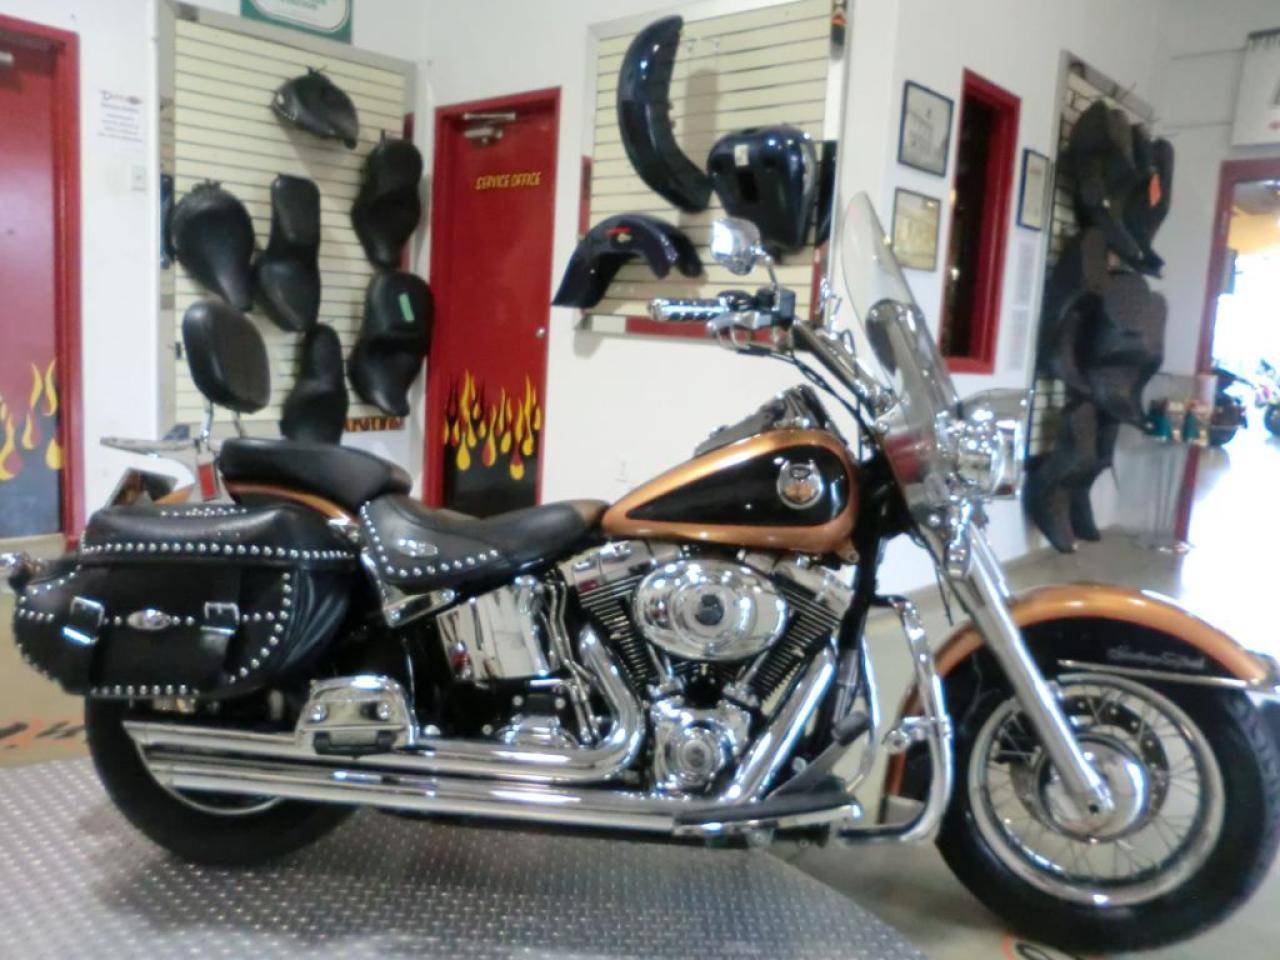 2008 Harley-Davidson Heritage Softail Classic FLSTC 105 TH ANNIVERSARY